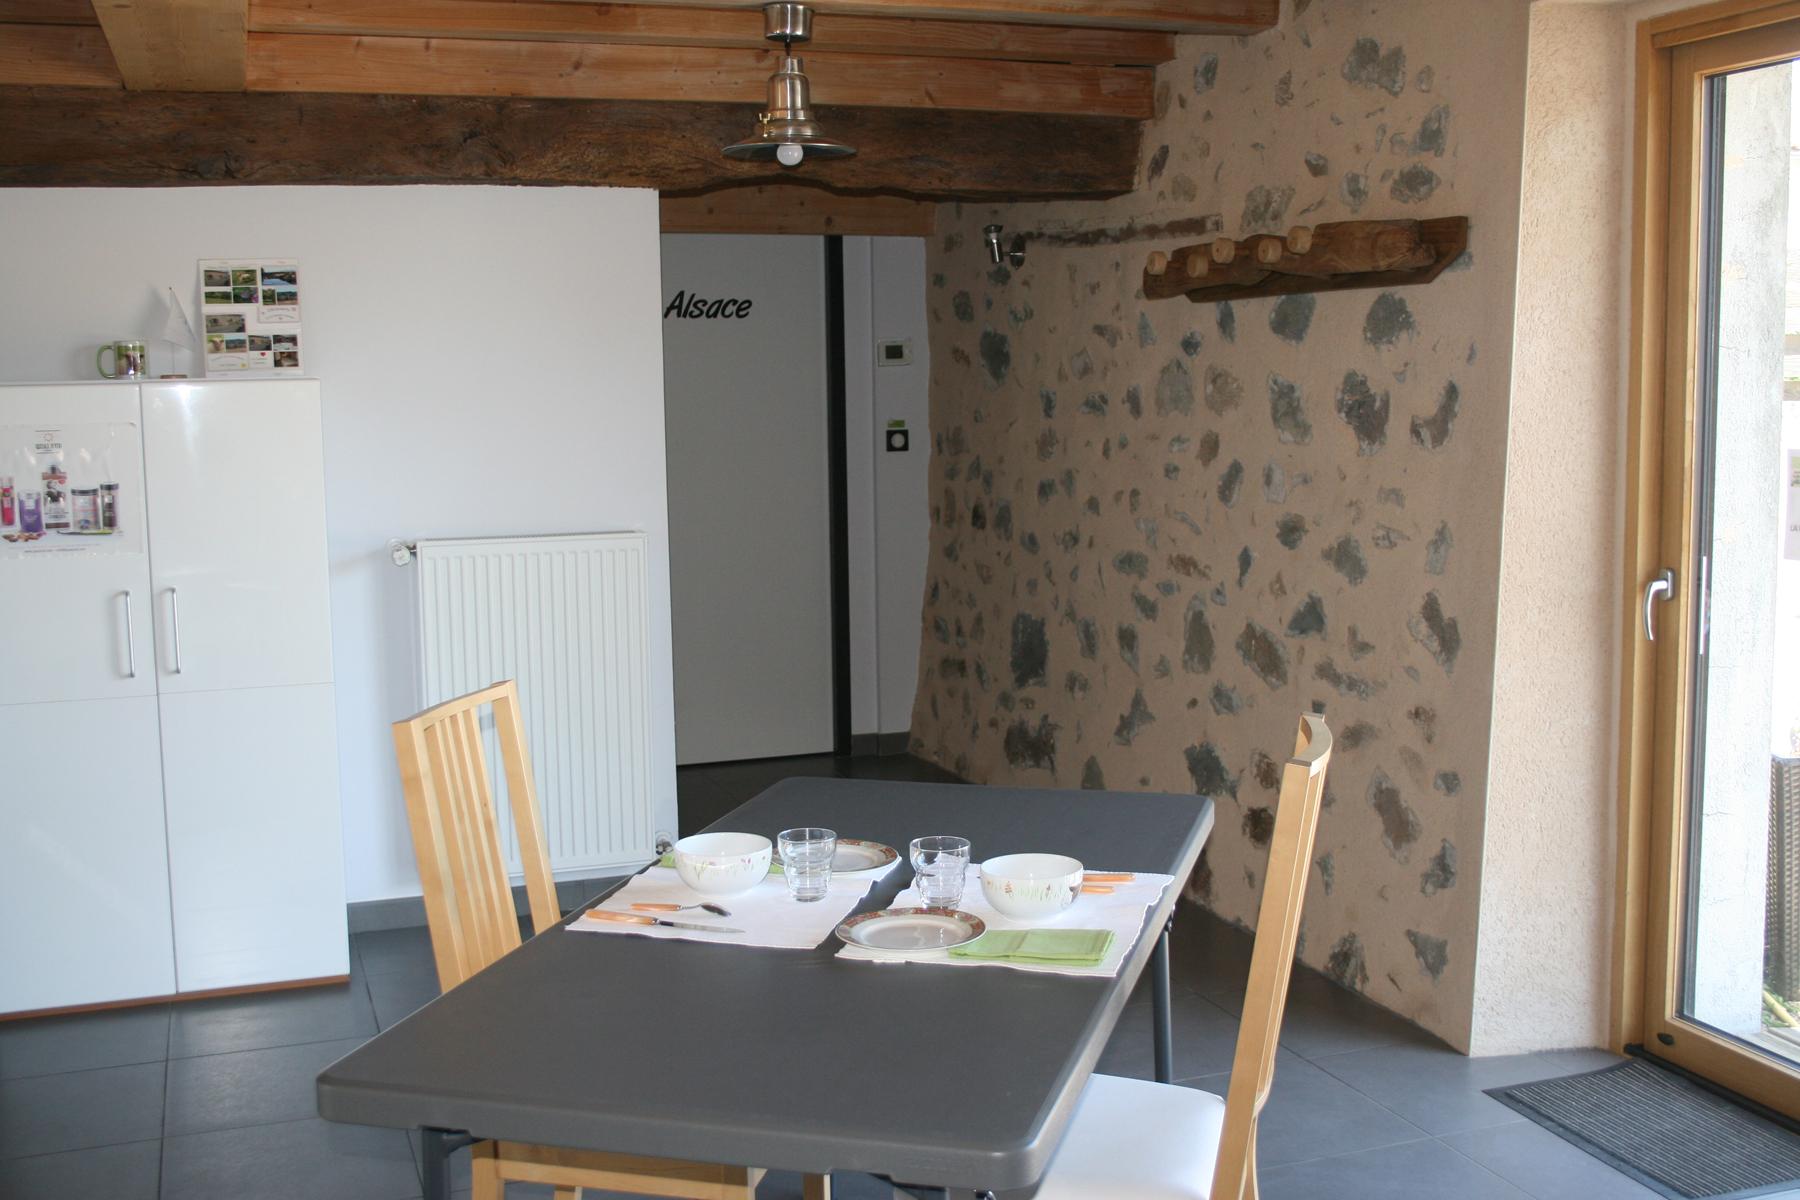 La table de la chambre Alsace